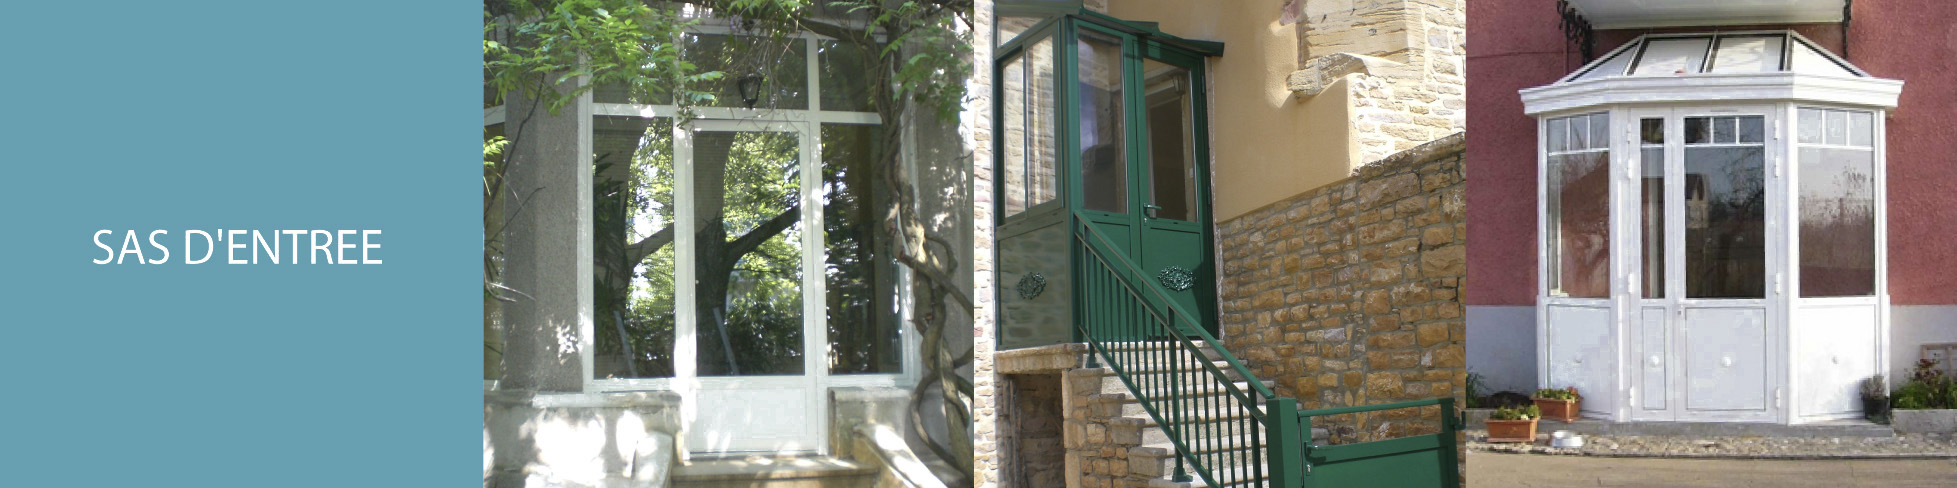 Aluver verandas moderne traditionnelle design bois alu pvc - Moderne entree veranda ...